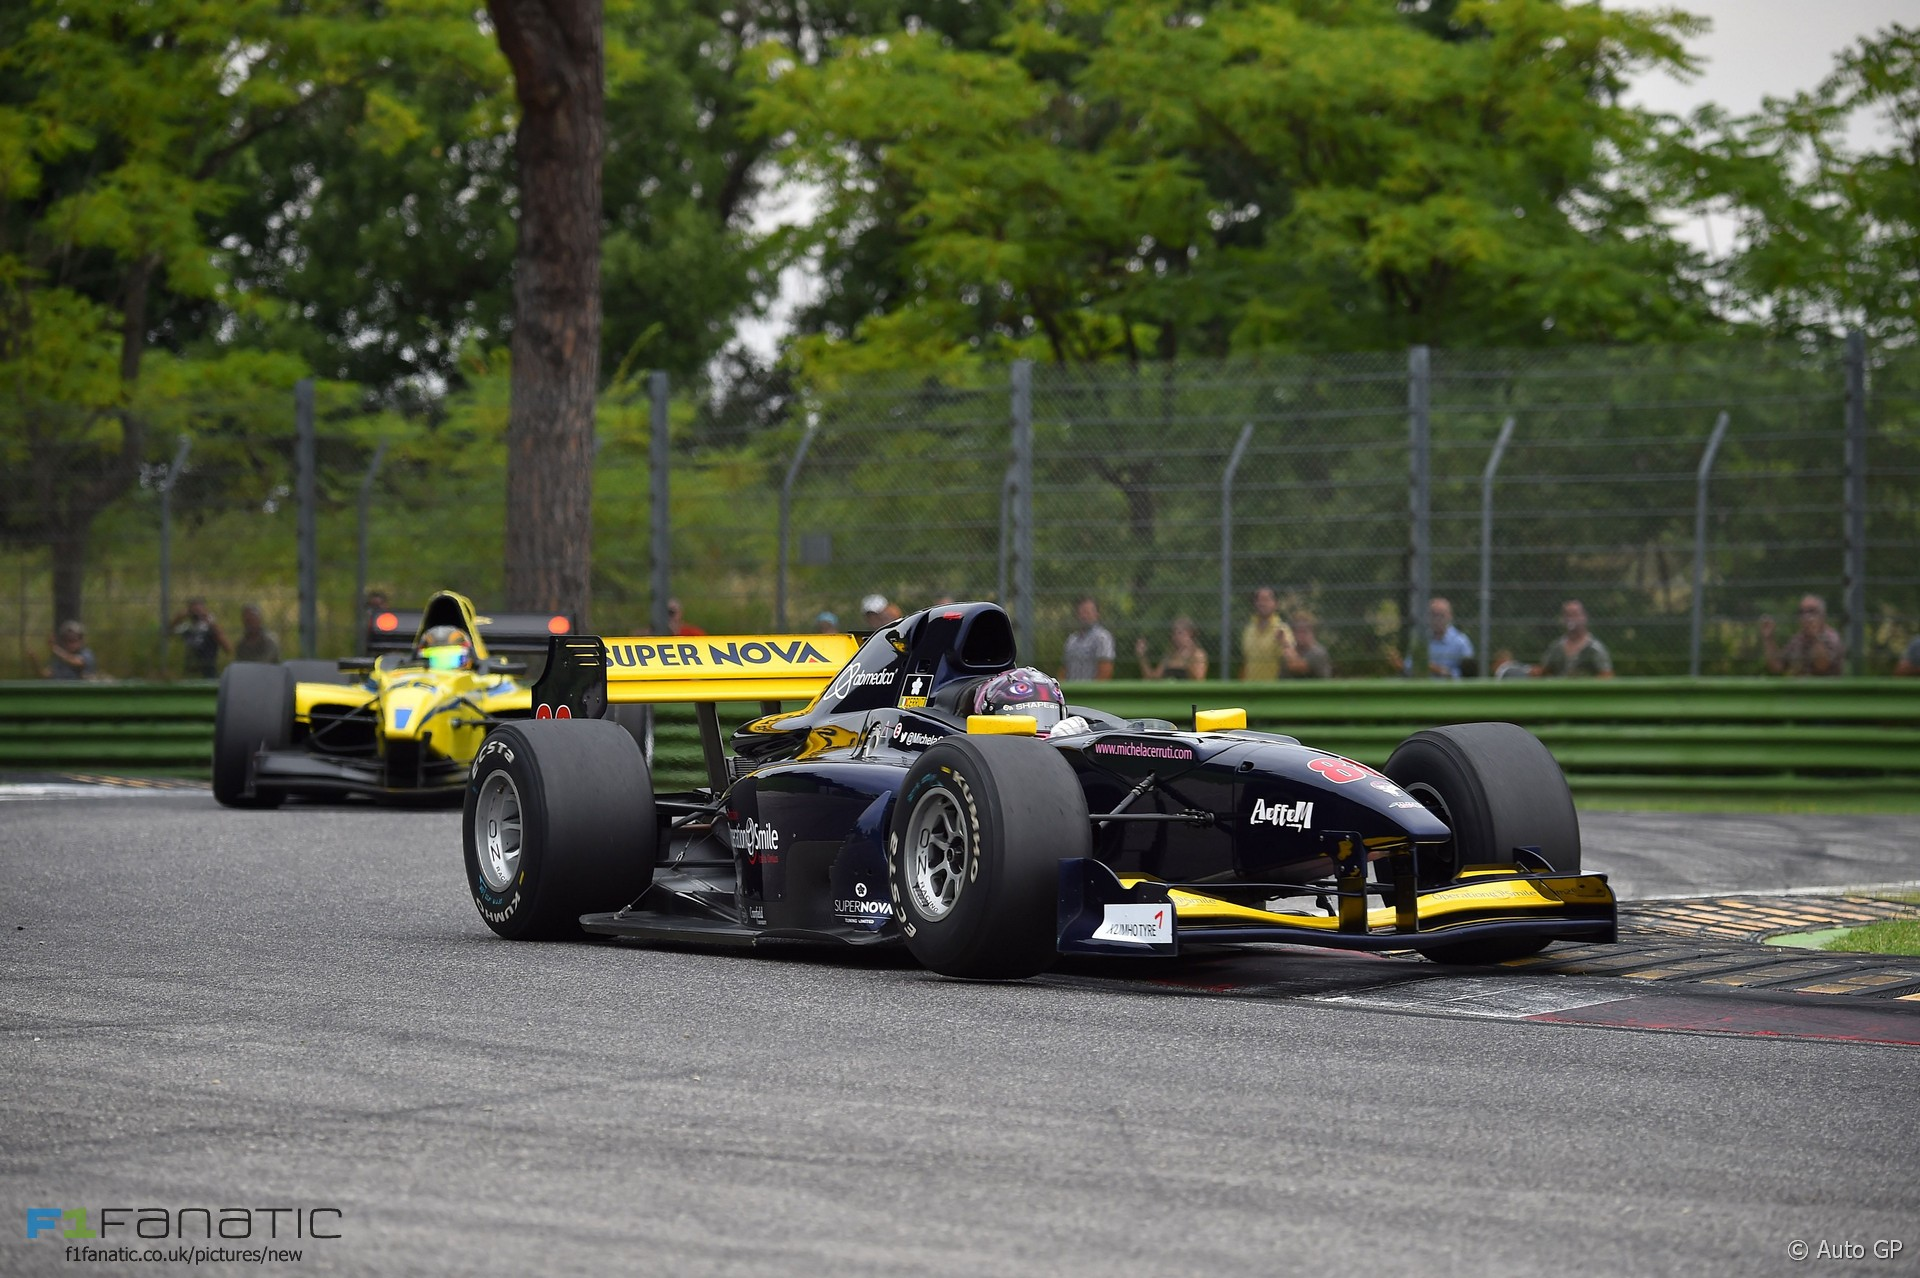 Michaele Cerruti, Auto GP, Imola, 2014